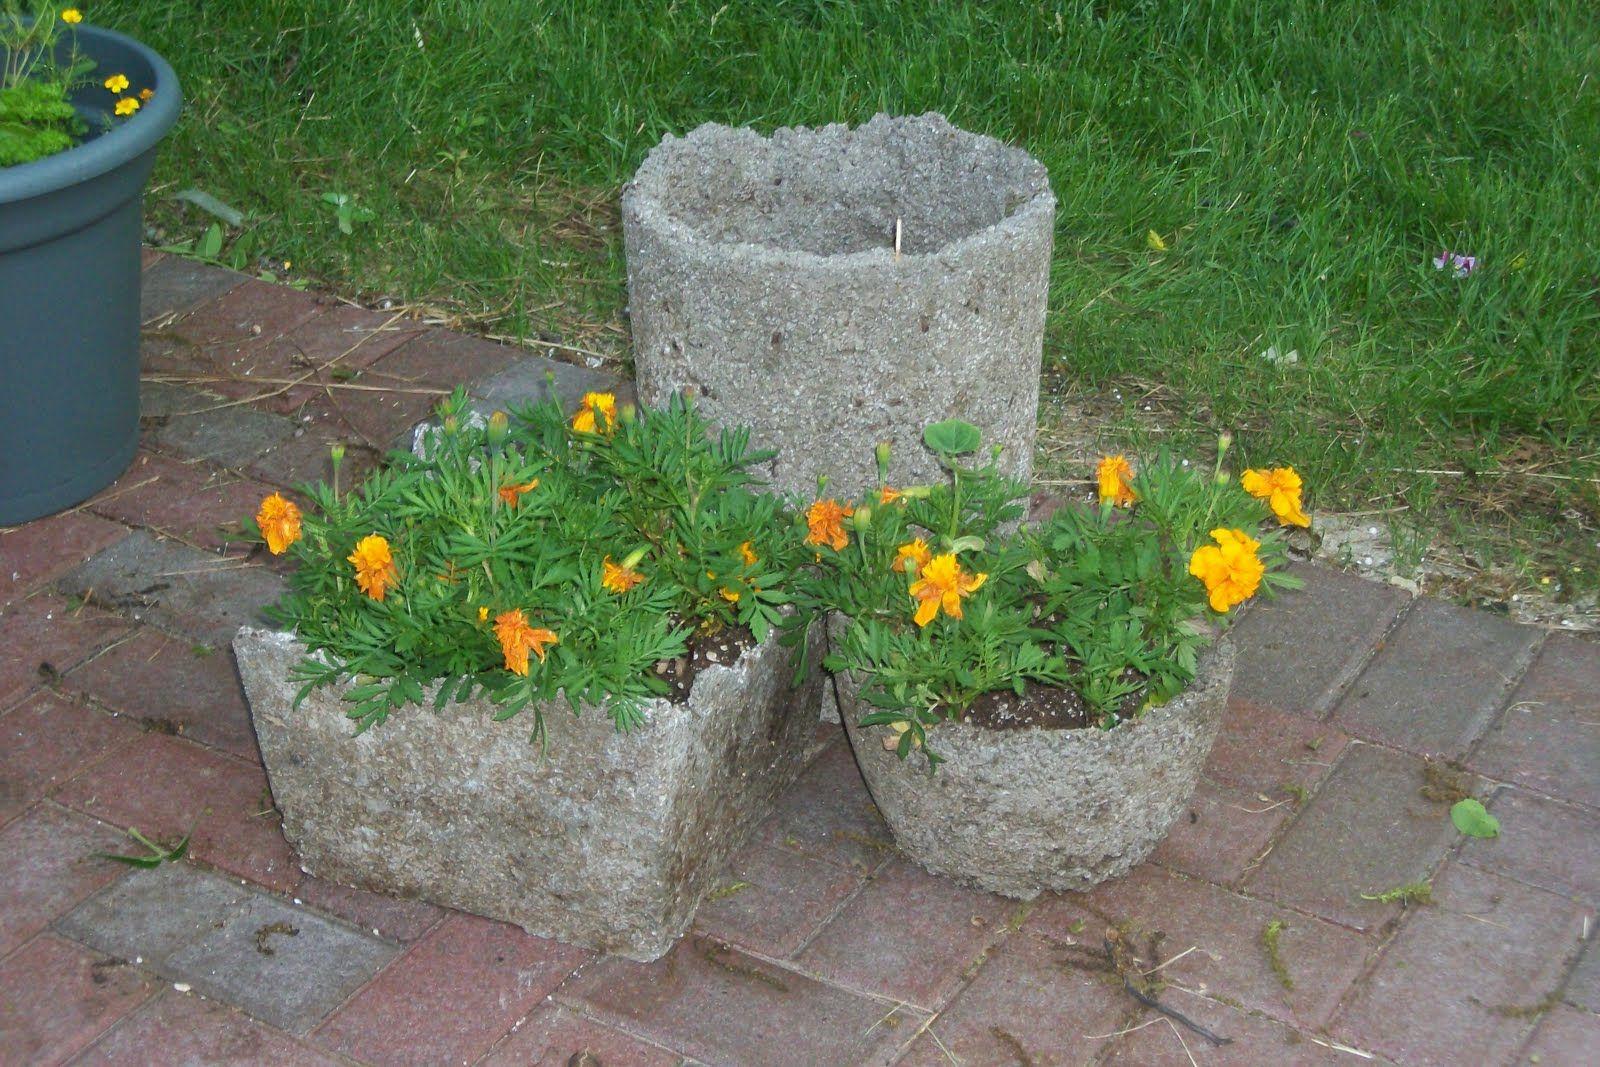 Hypertufa recipe using concrete mix the recipe for - Concrete projects for the garden ...